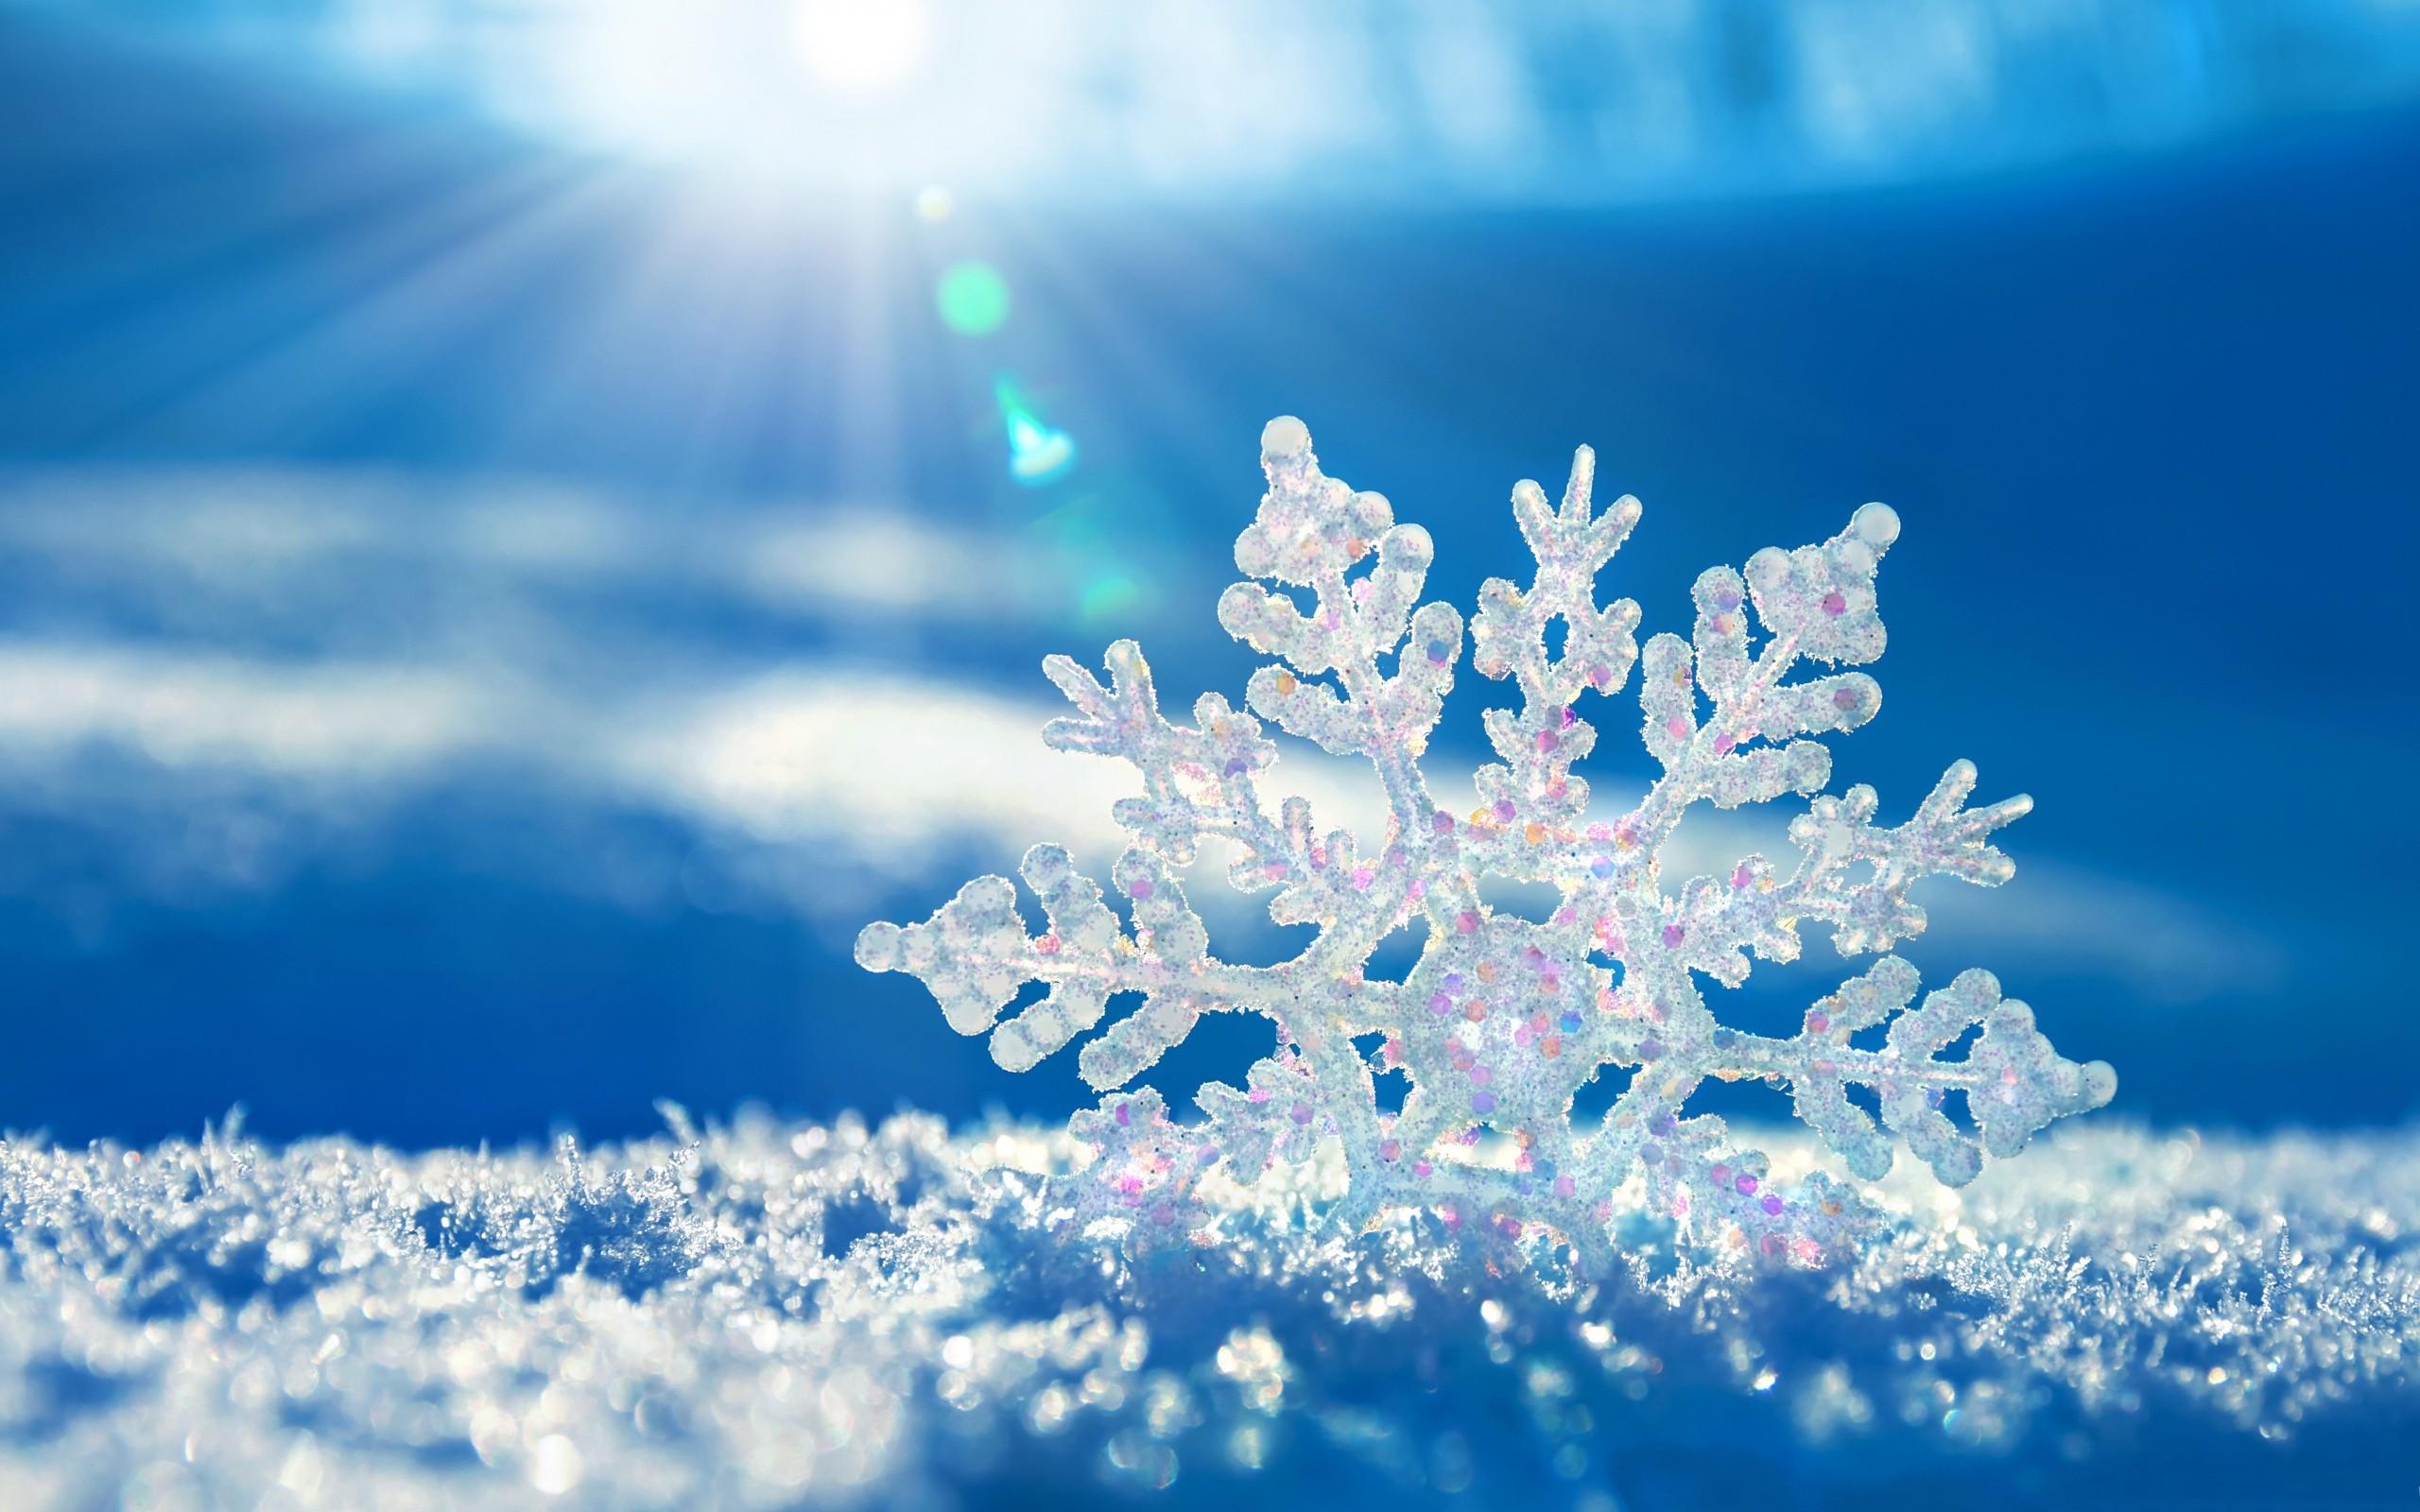 Res: 2560x1600, Snowflake Fresh Cool White Blue Good Nice Amazing Desktop Wallpapers